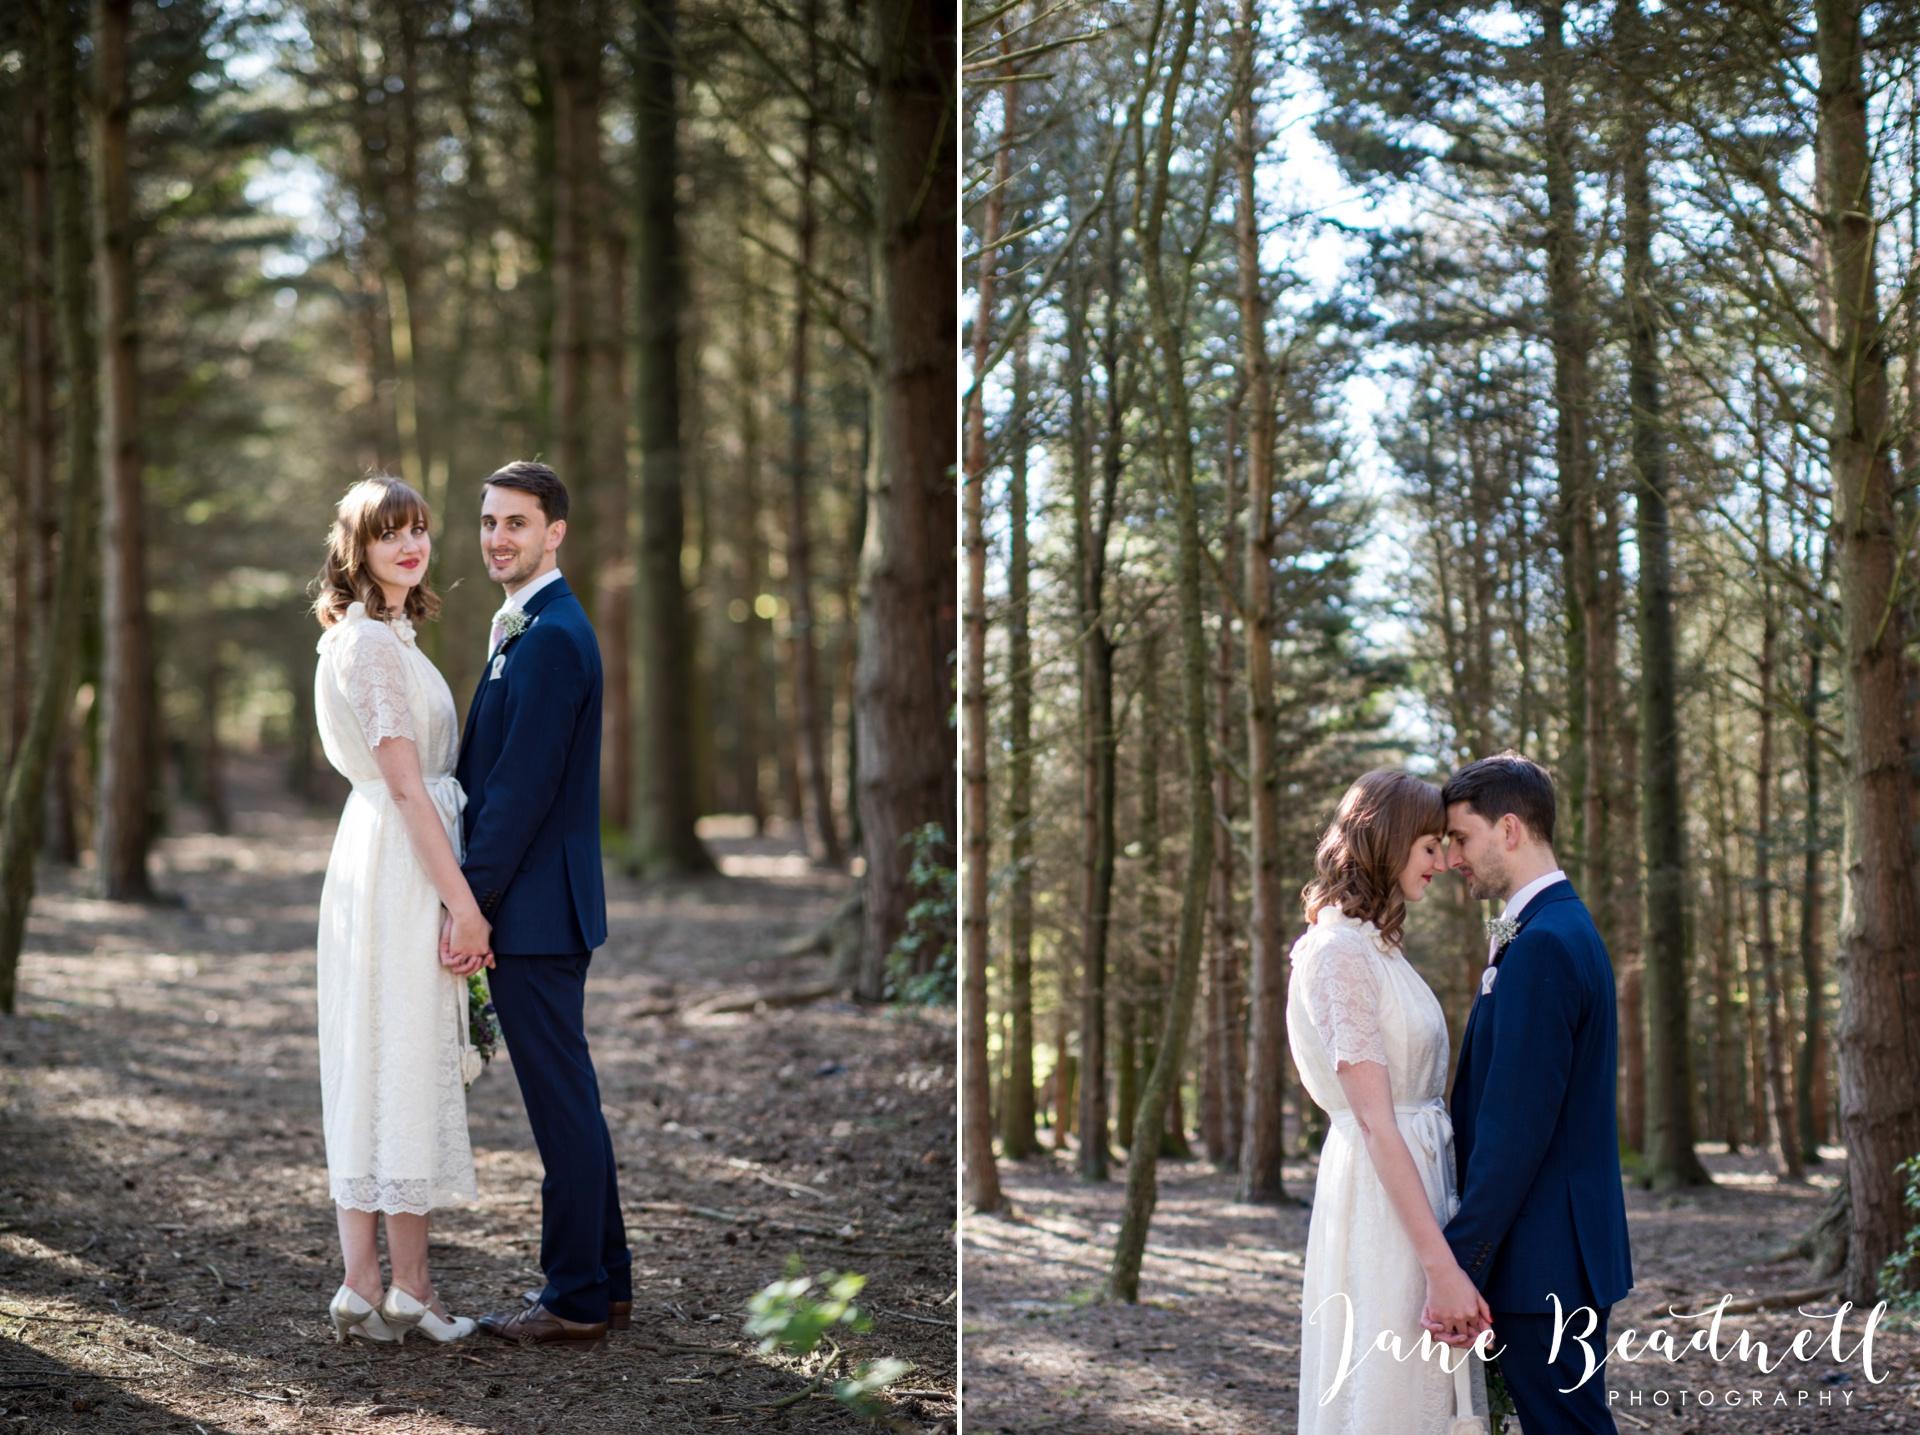 Jane Beadnell fine art wedding photographer The Cheerful Chilli Barn Otley_0033